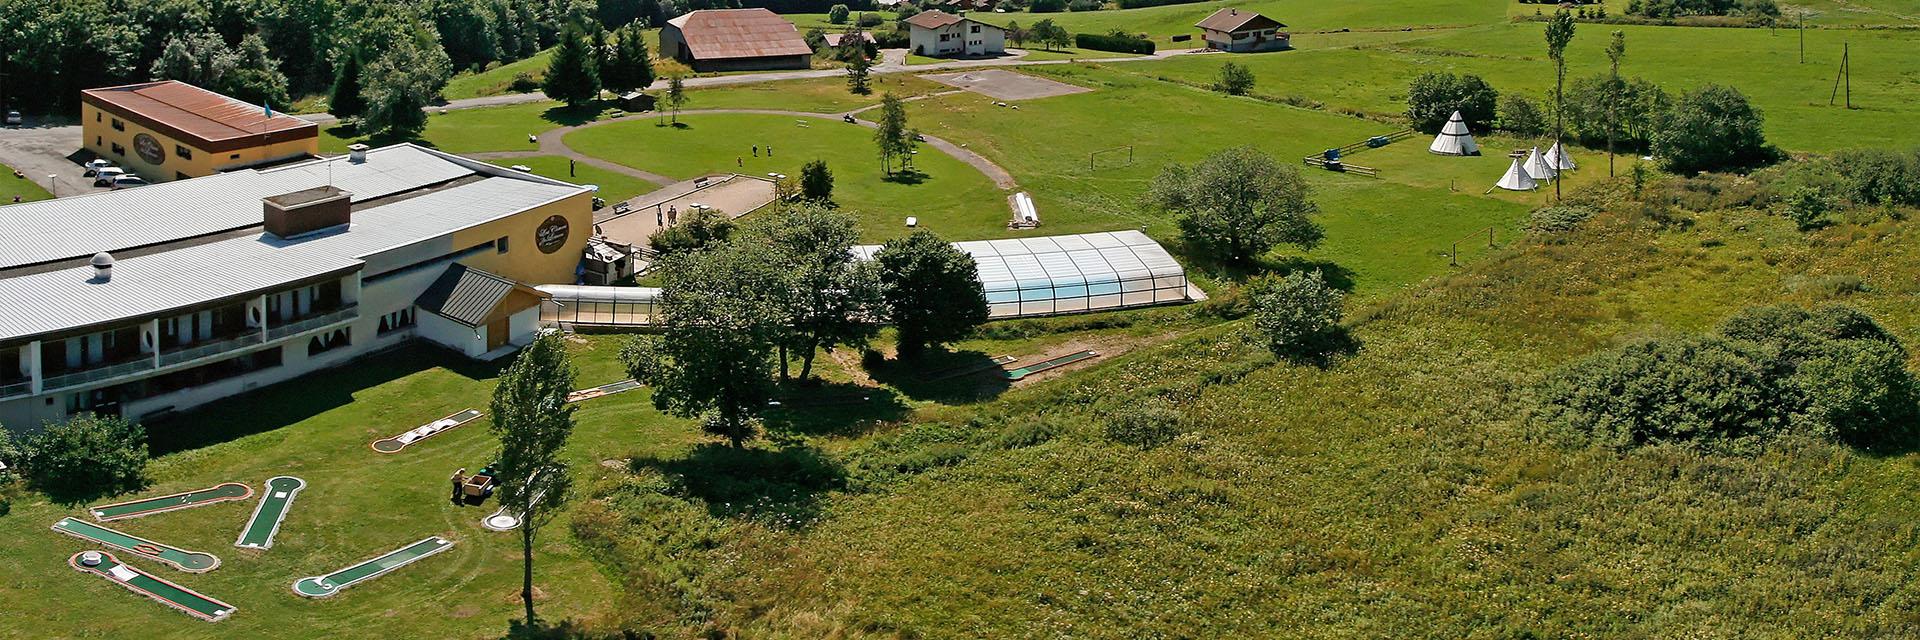 Village_club_vacances_haute-savoie_leman-village